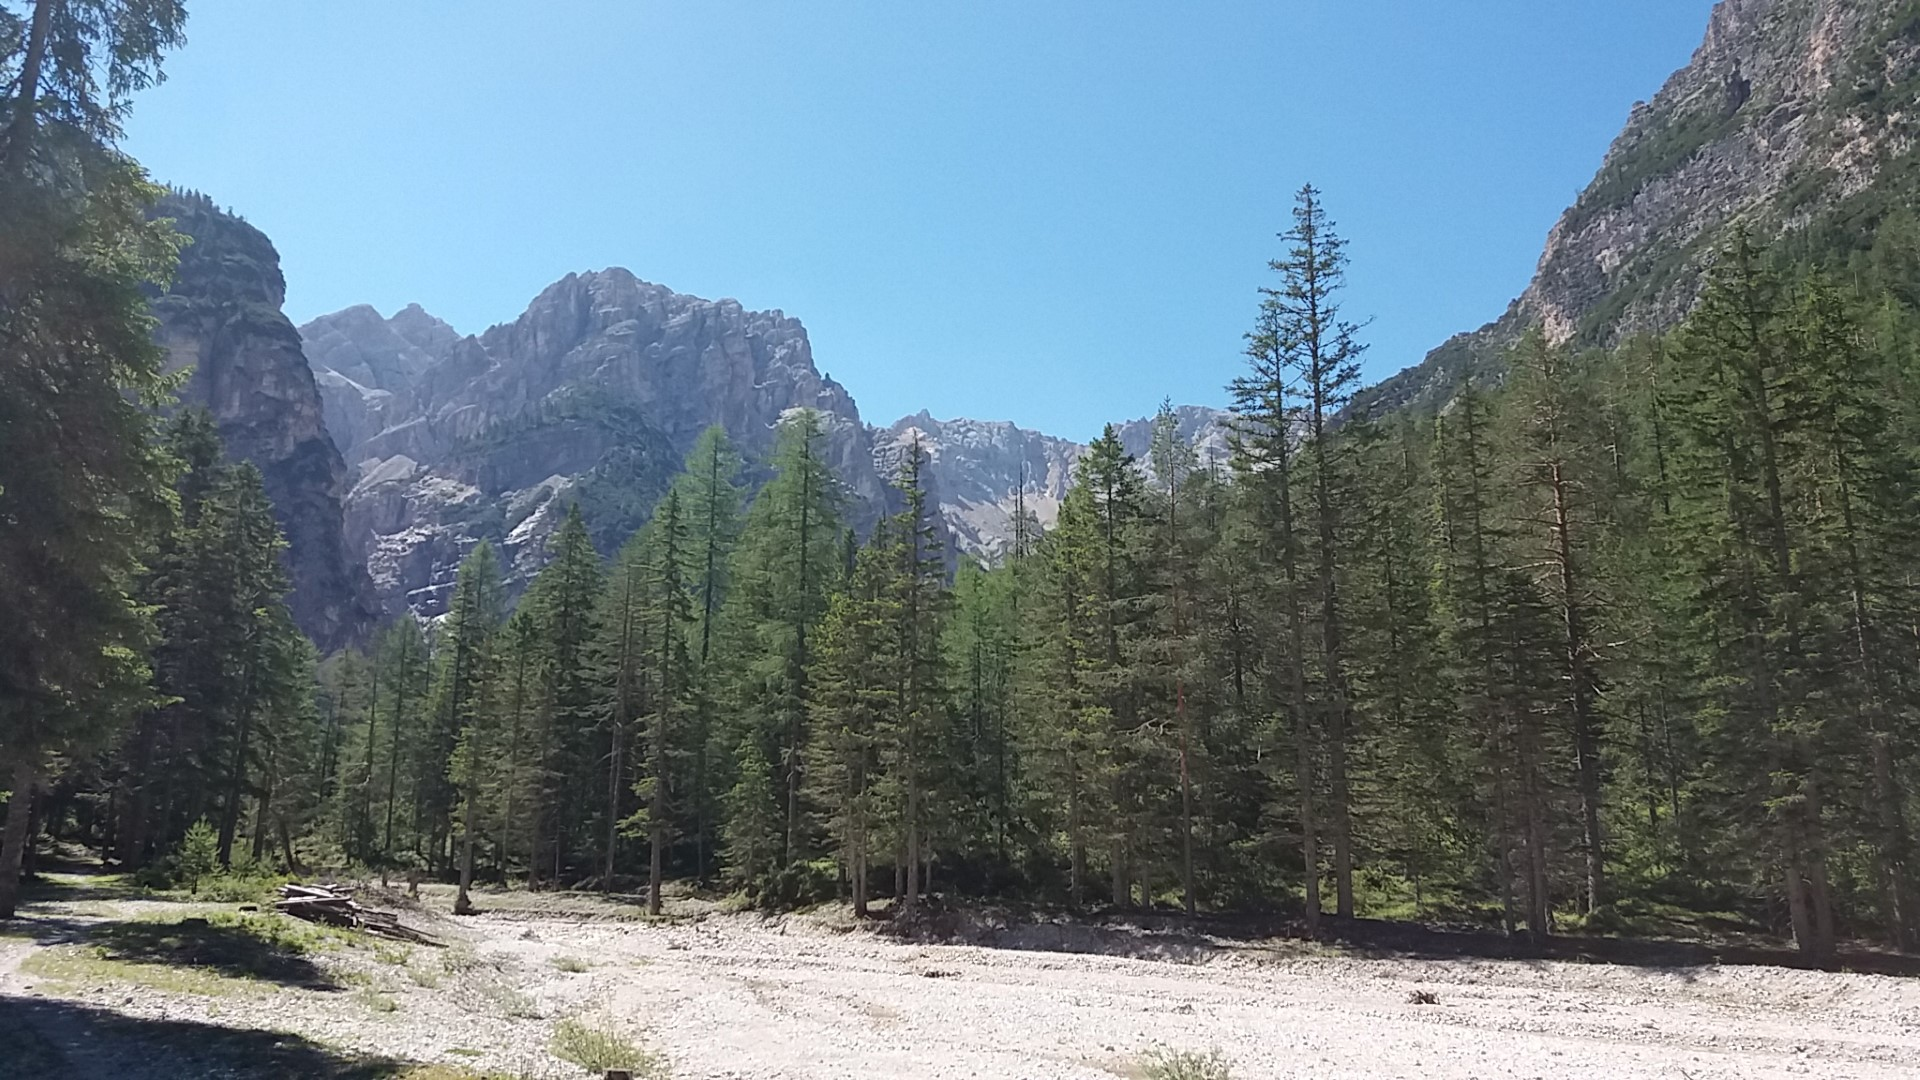 Sentiero dal Tamersc al pederu